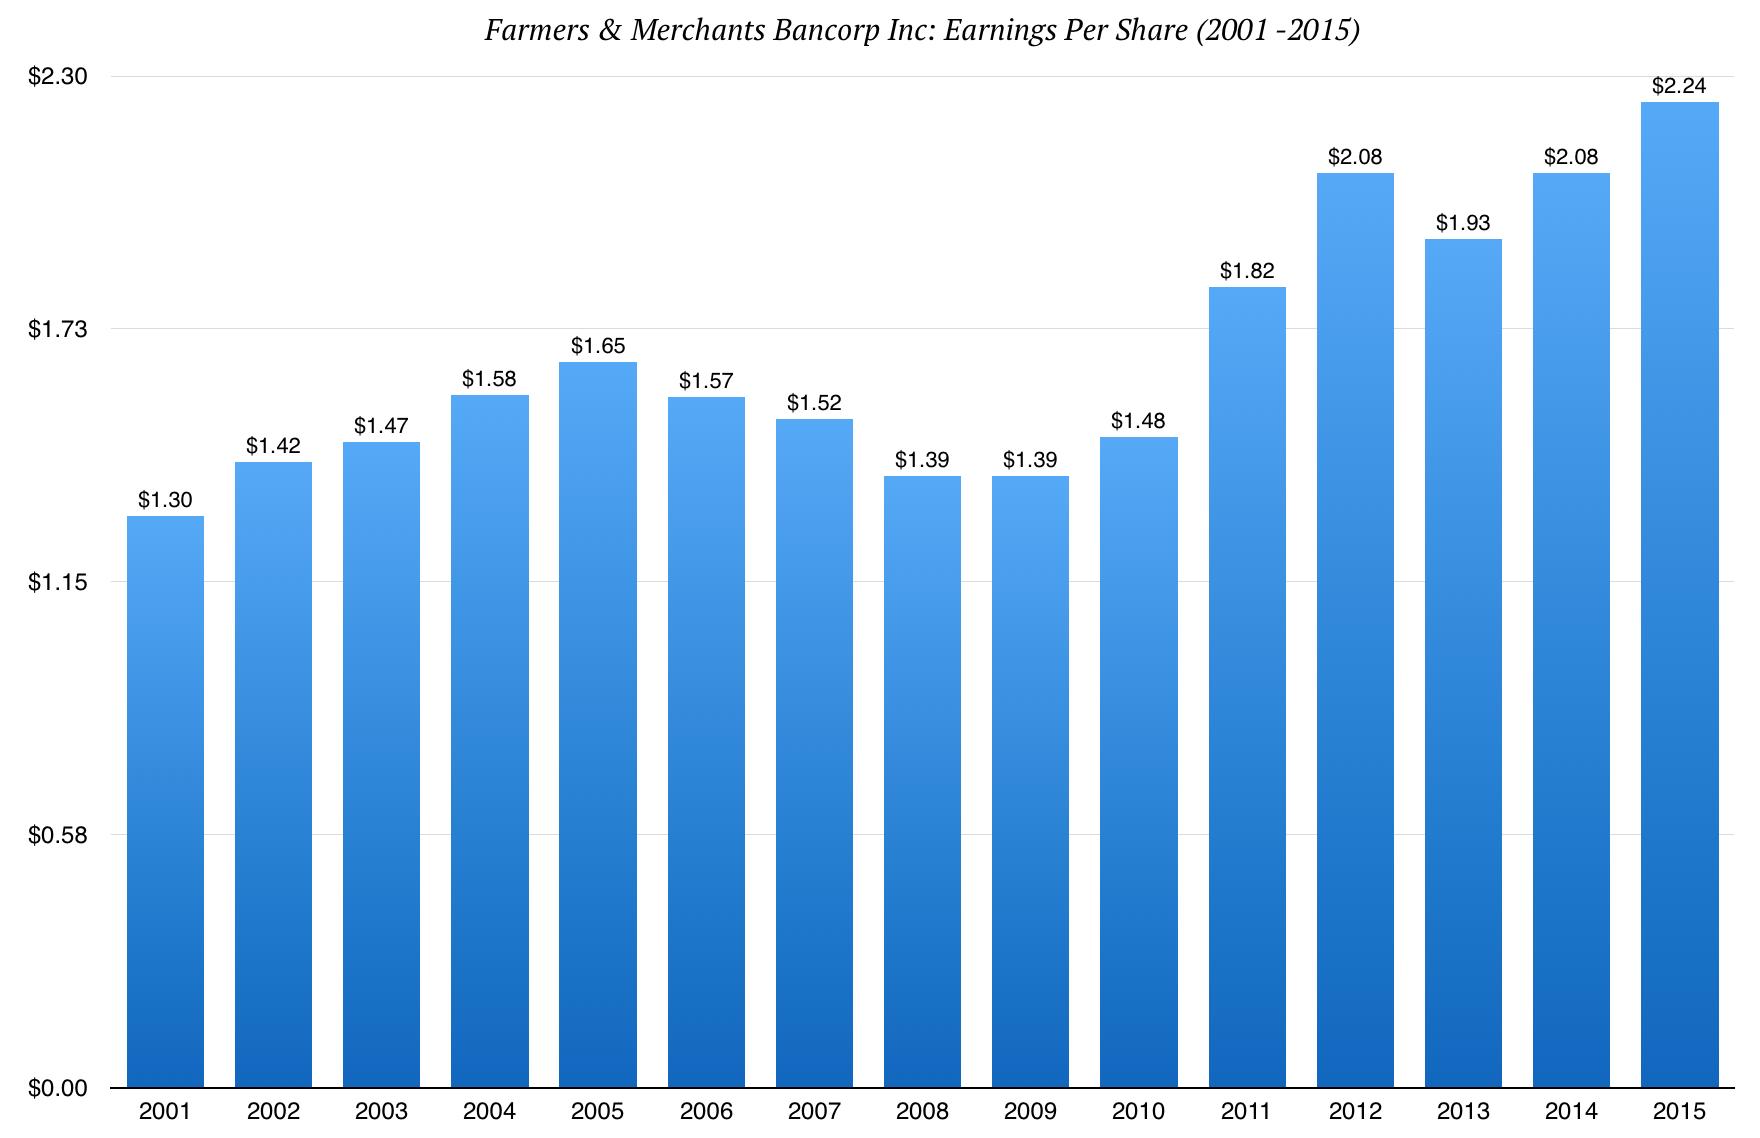 farmersmerchants_bancorp_inc_earnings_history